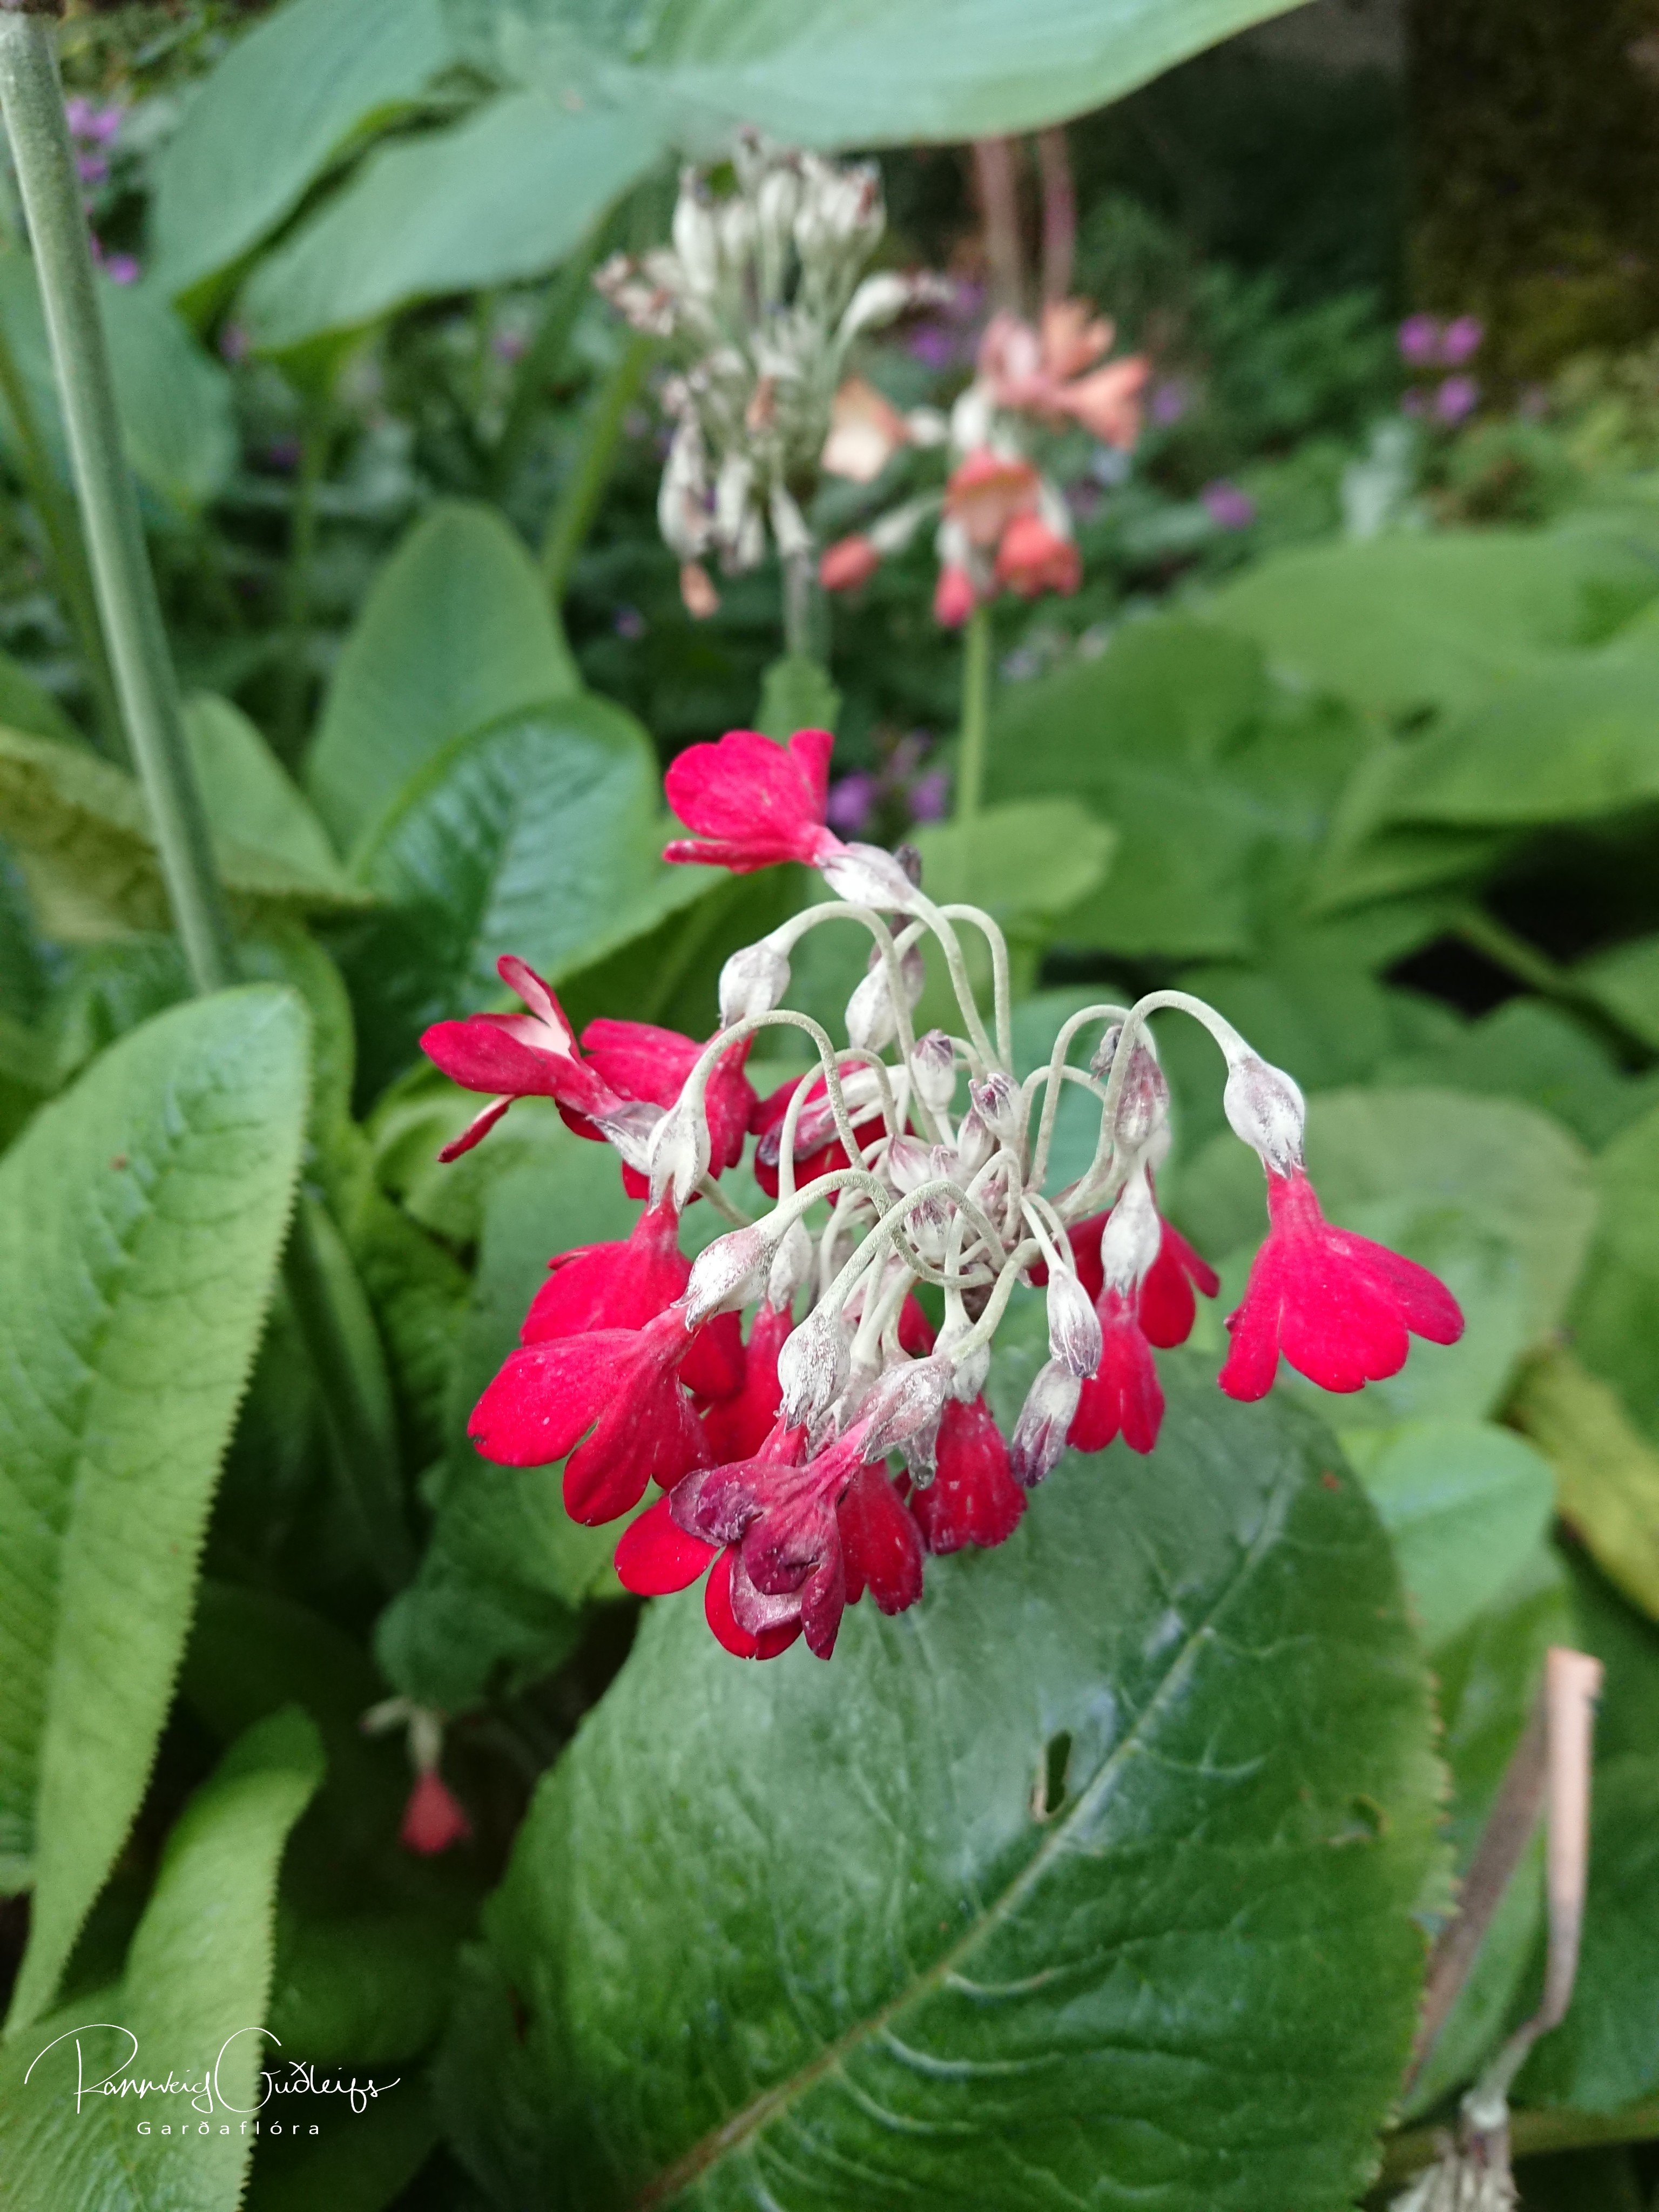 Primula florindae 'Red Shades'